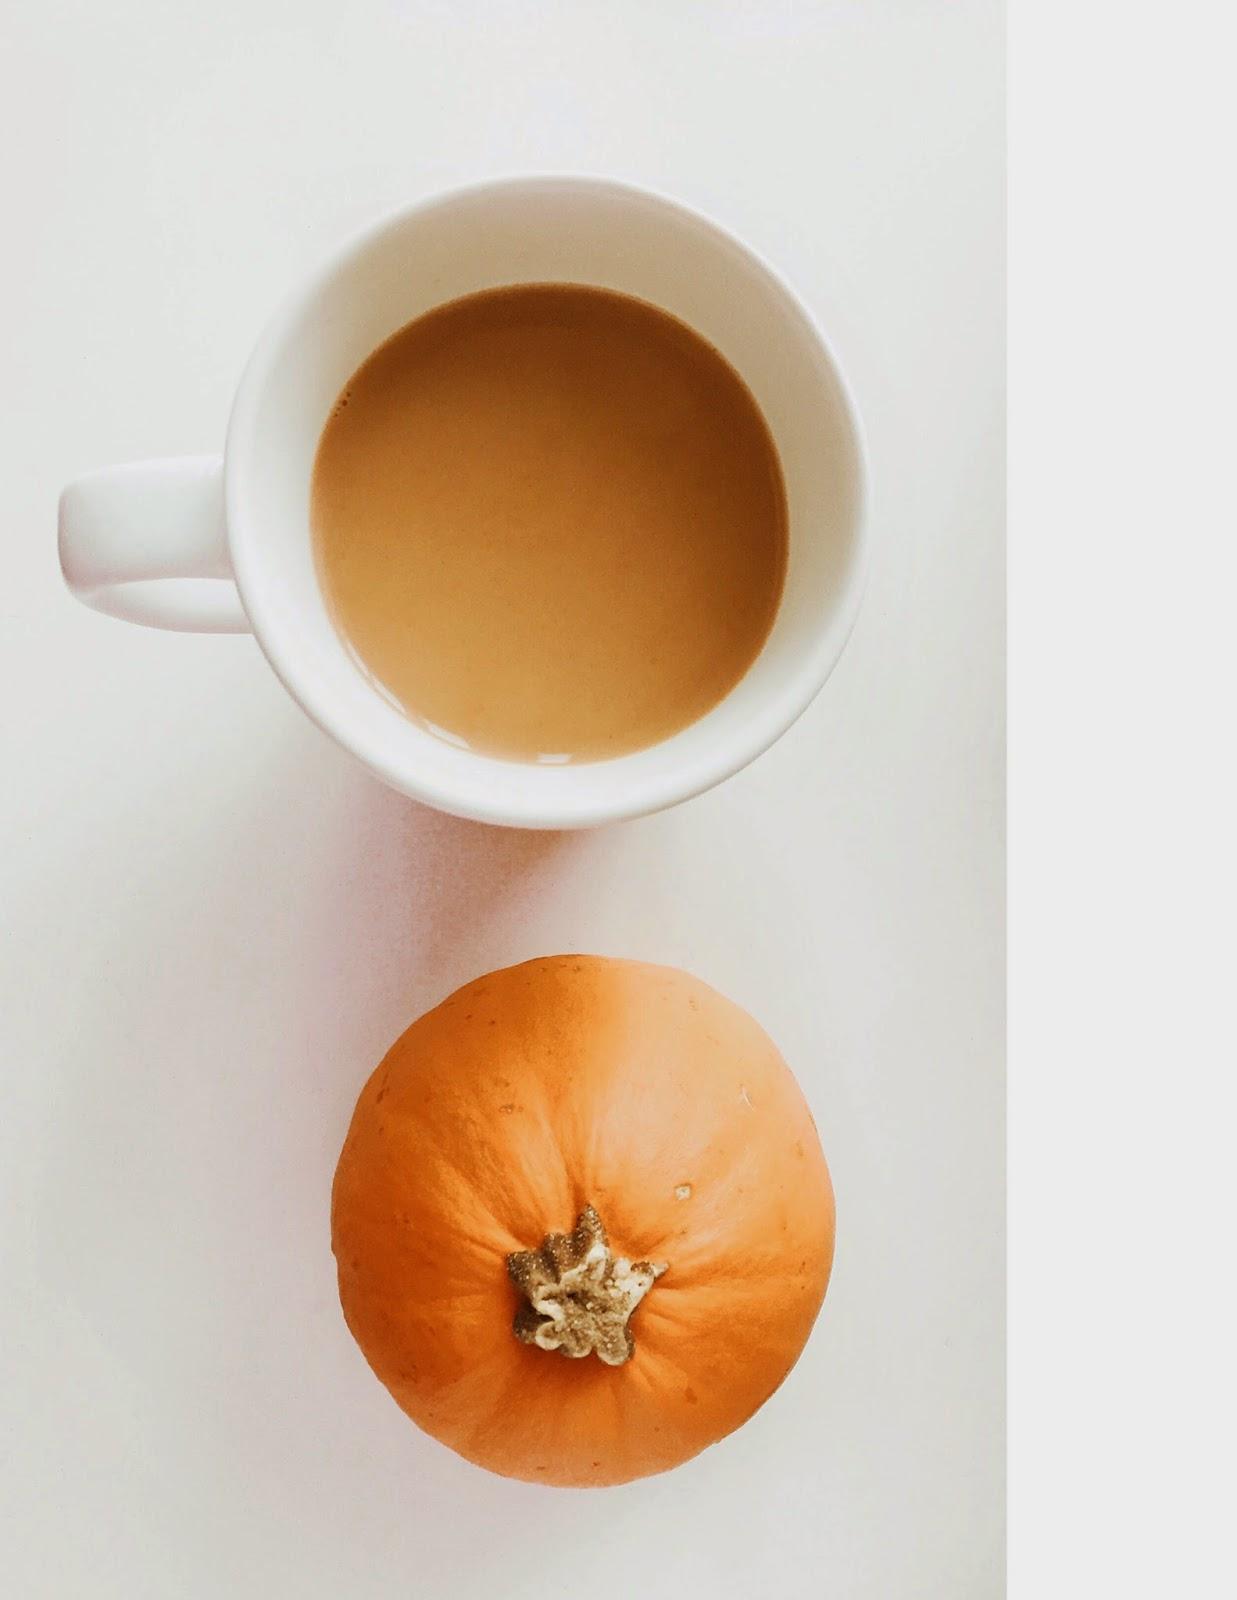 llovestoshare.blogspot.com : Bye, November